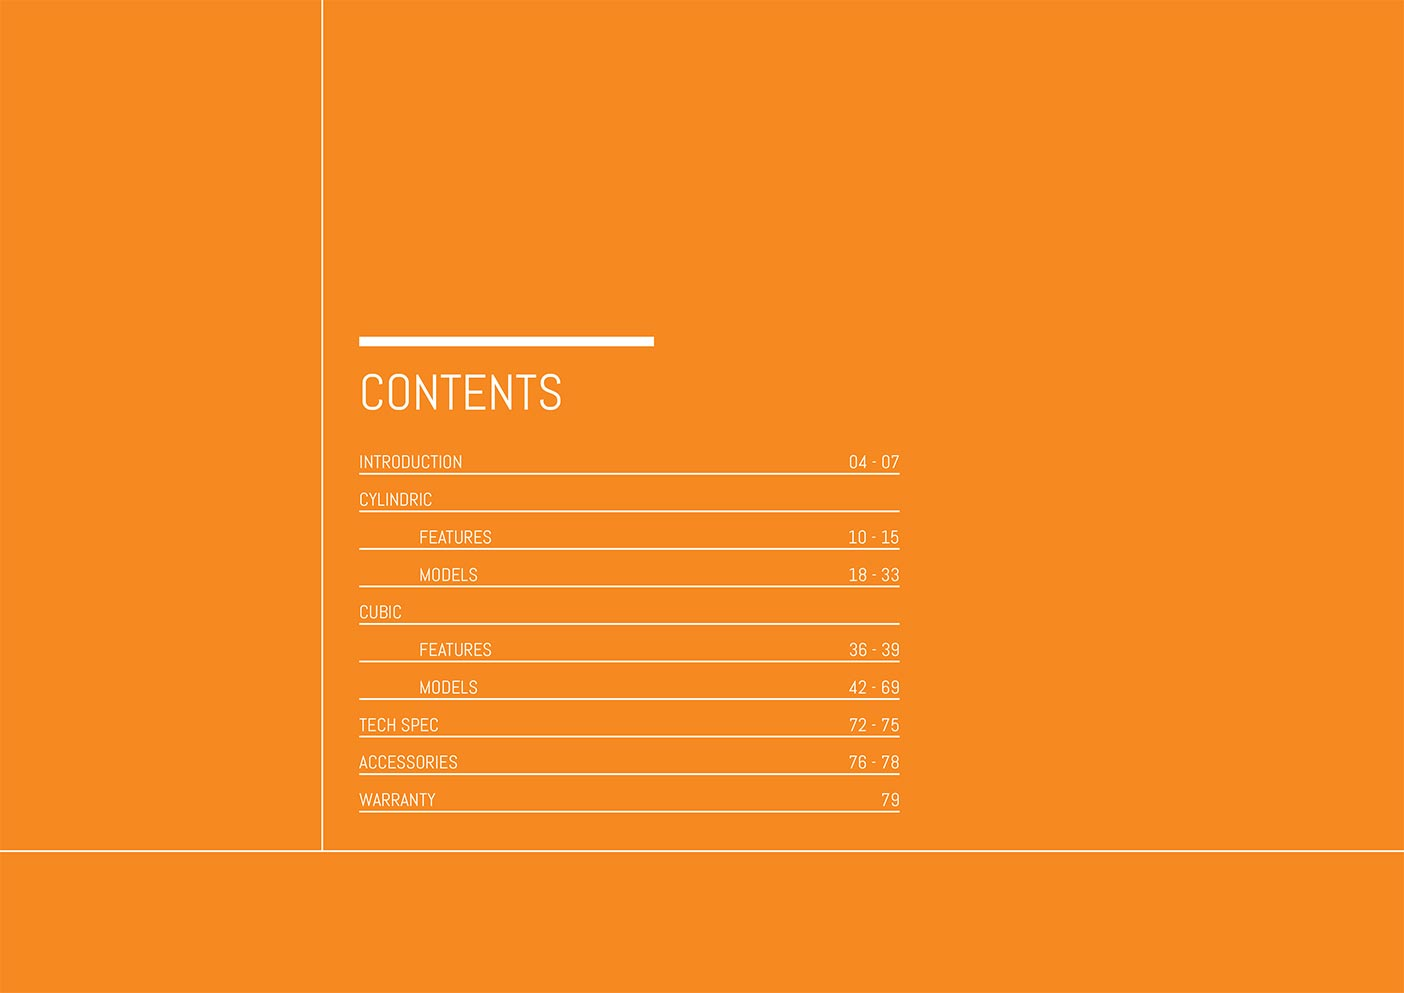 opus-stoves-brochure-(2)-3